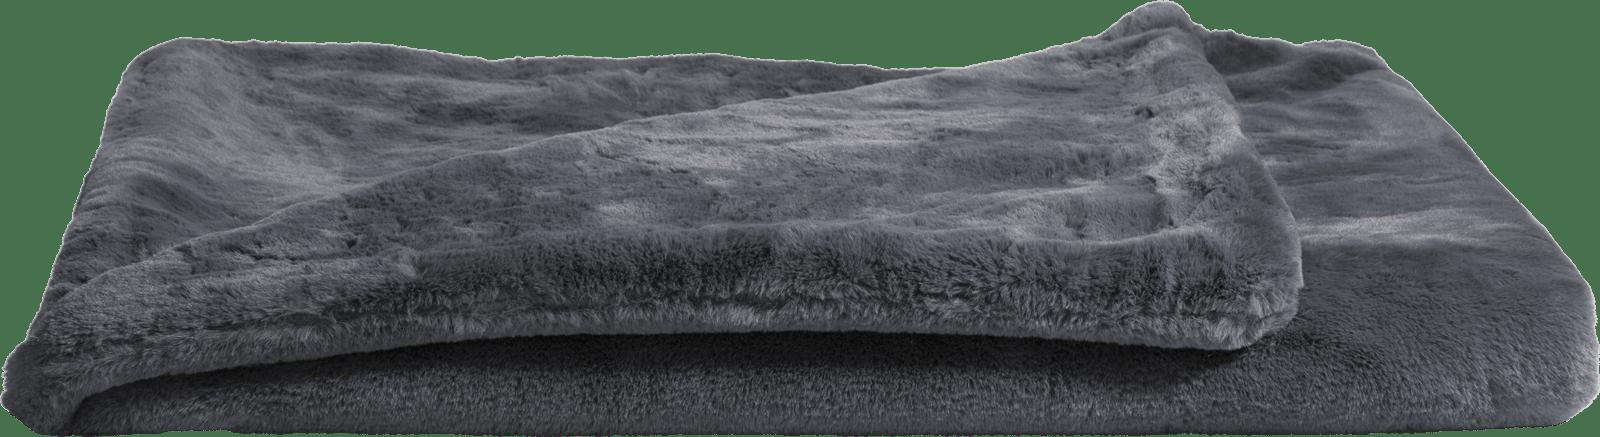 XOOON - Coco Maison - evie throw 130x160cm